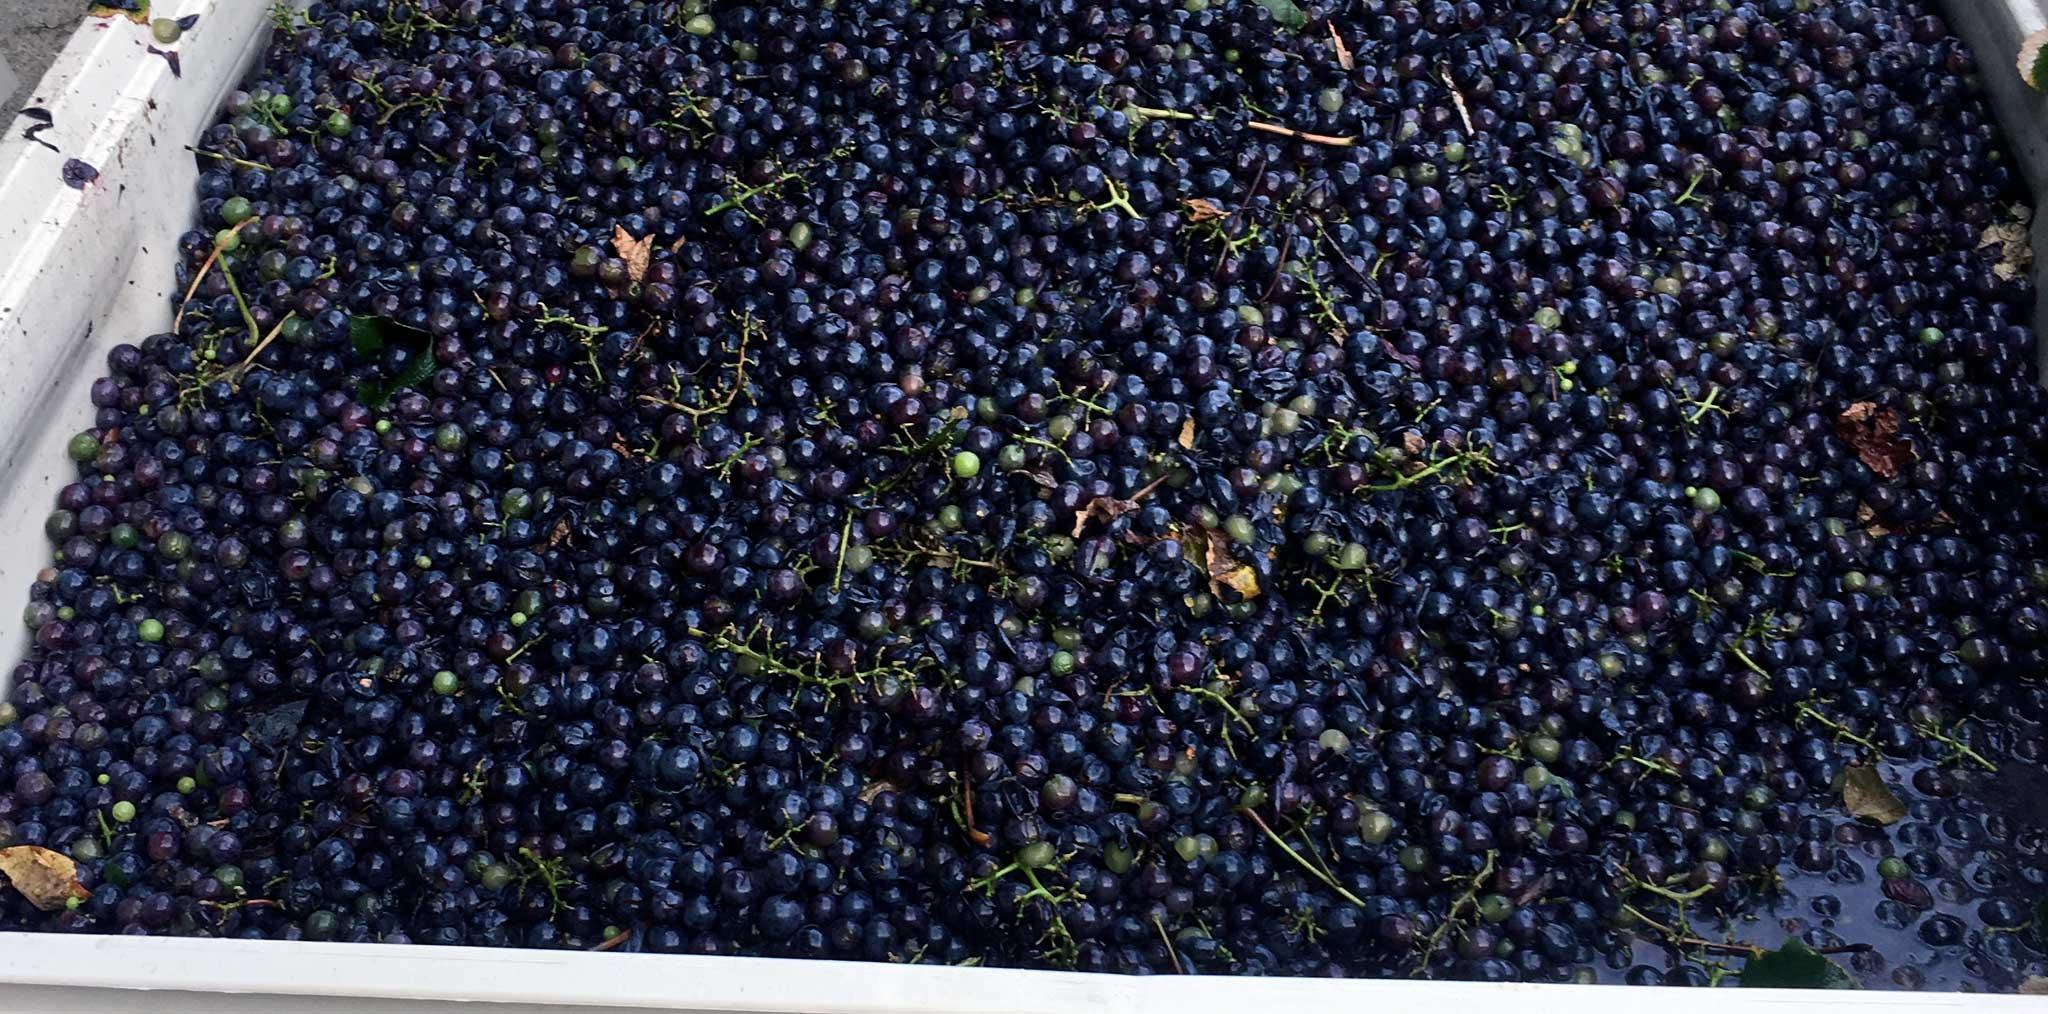 French Ridge Vineyards — Grape Harvest Season